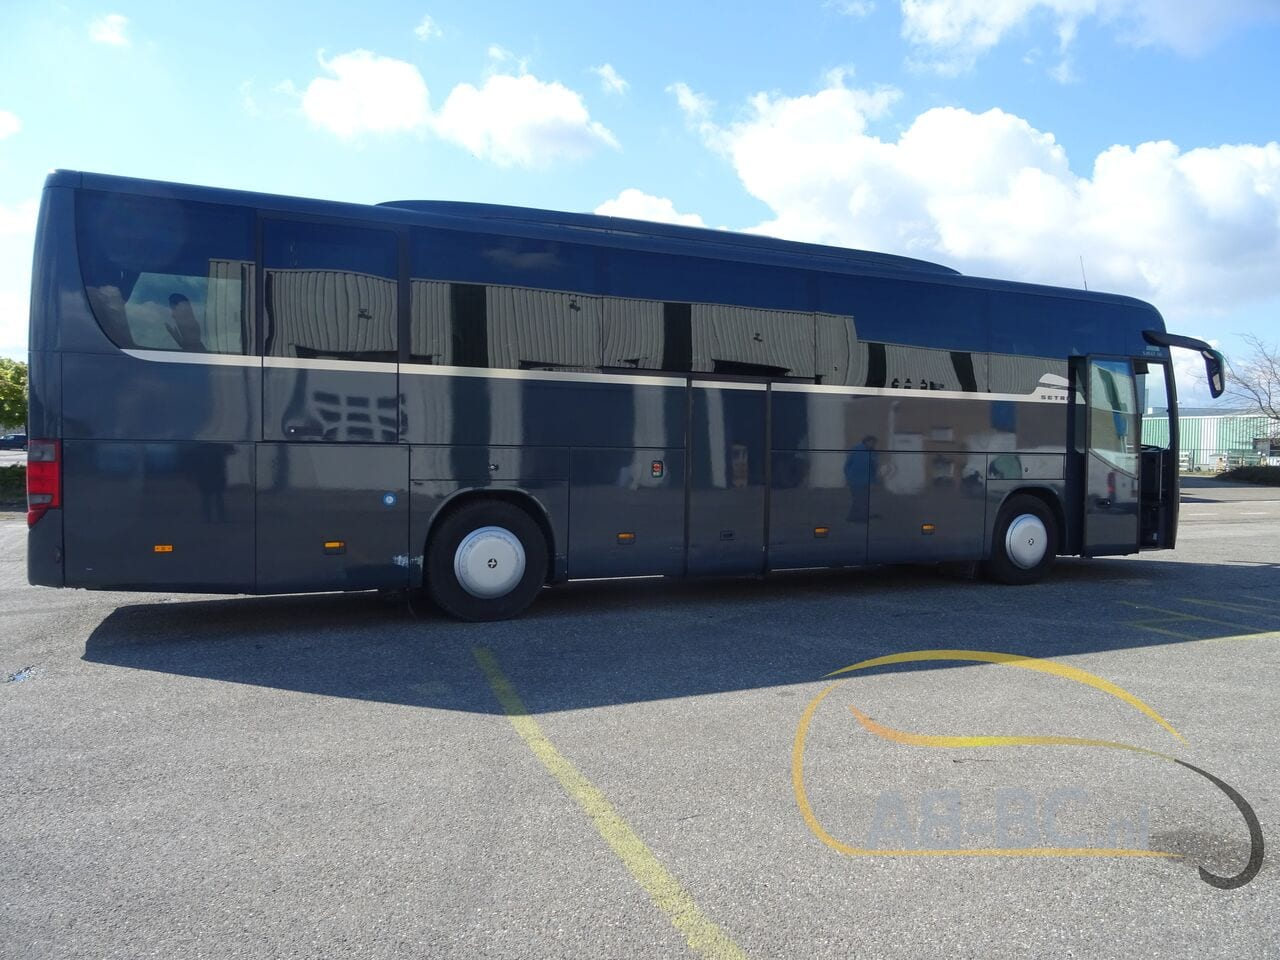 coach-busSETRA-S415-GT-HD-FINAL-EDITION-51-SEATS-LIFTBUS---1620381816320883783_big_8c61cba7d46cb09850fa3f14c83e44e0--21050713010665719300